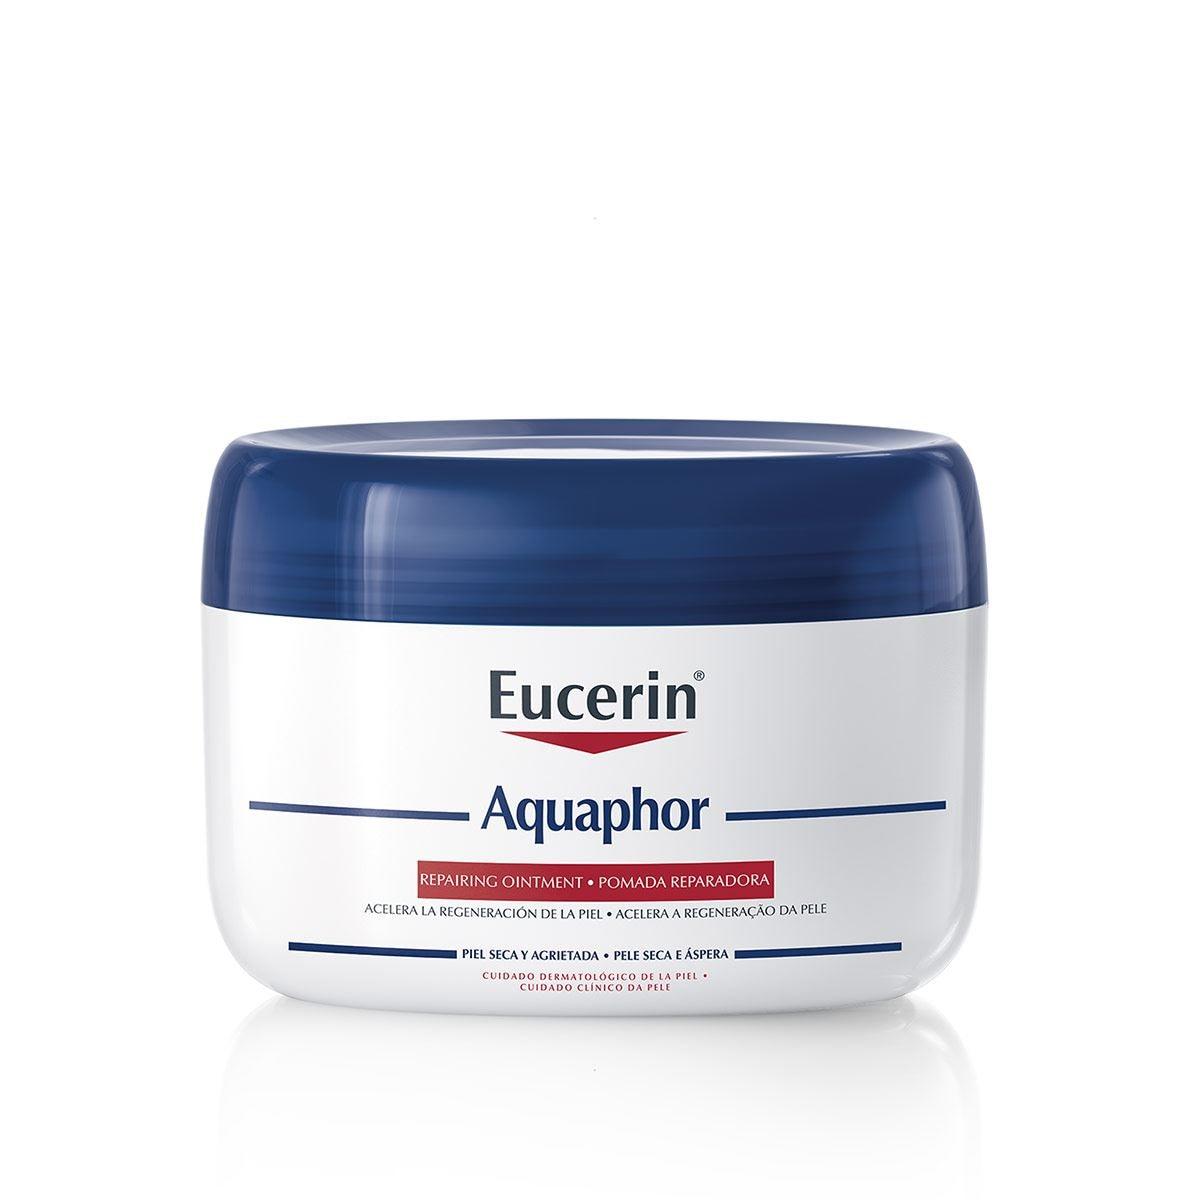 Eucerin Aquaphor Tarro, 100ml